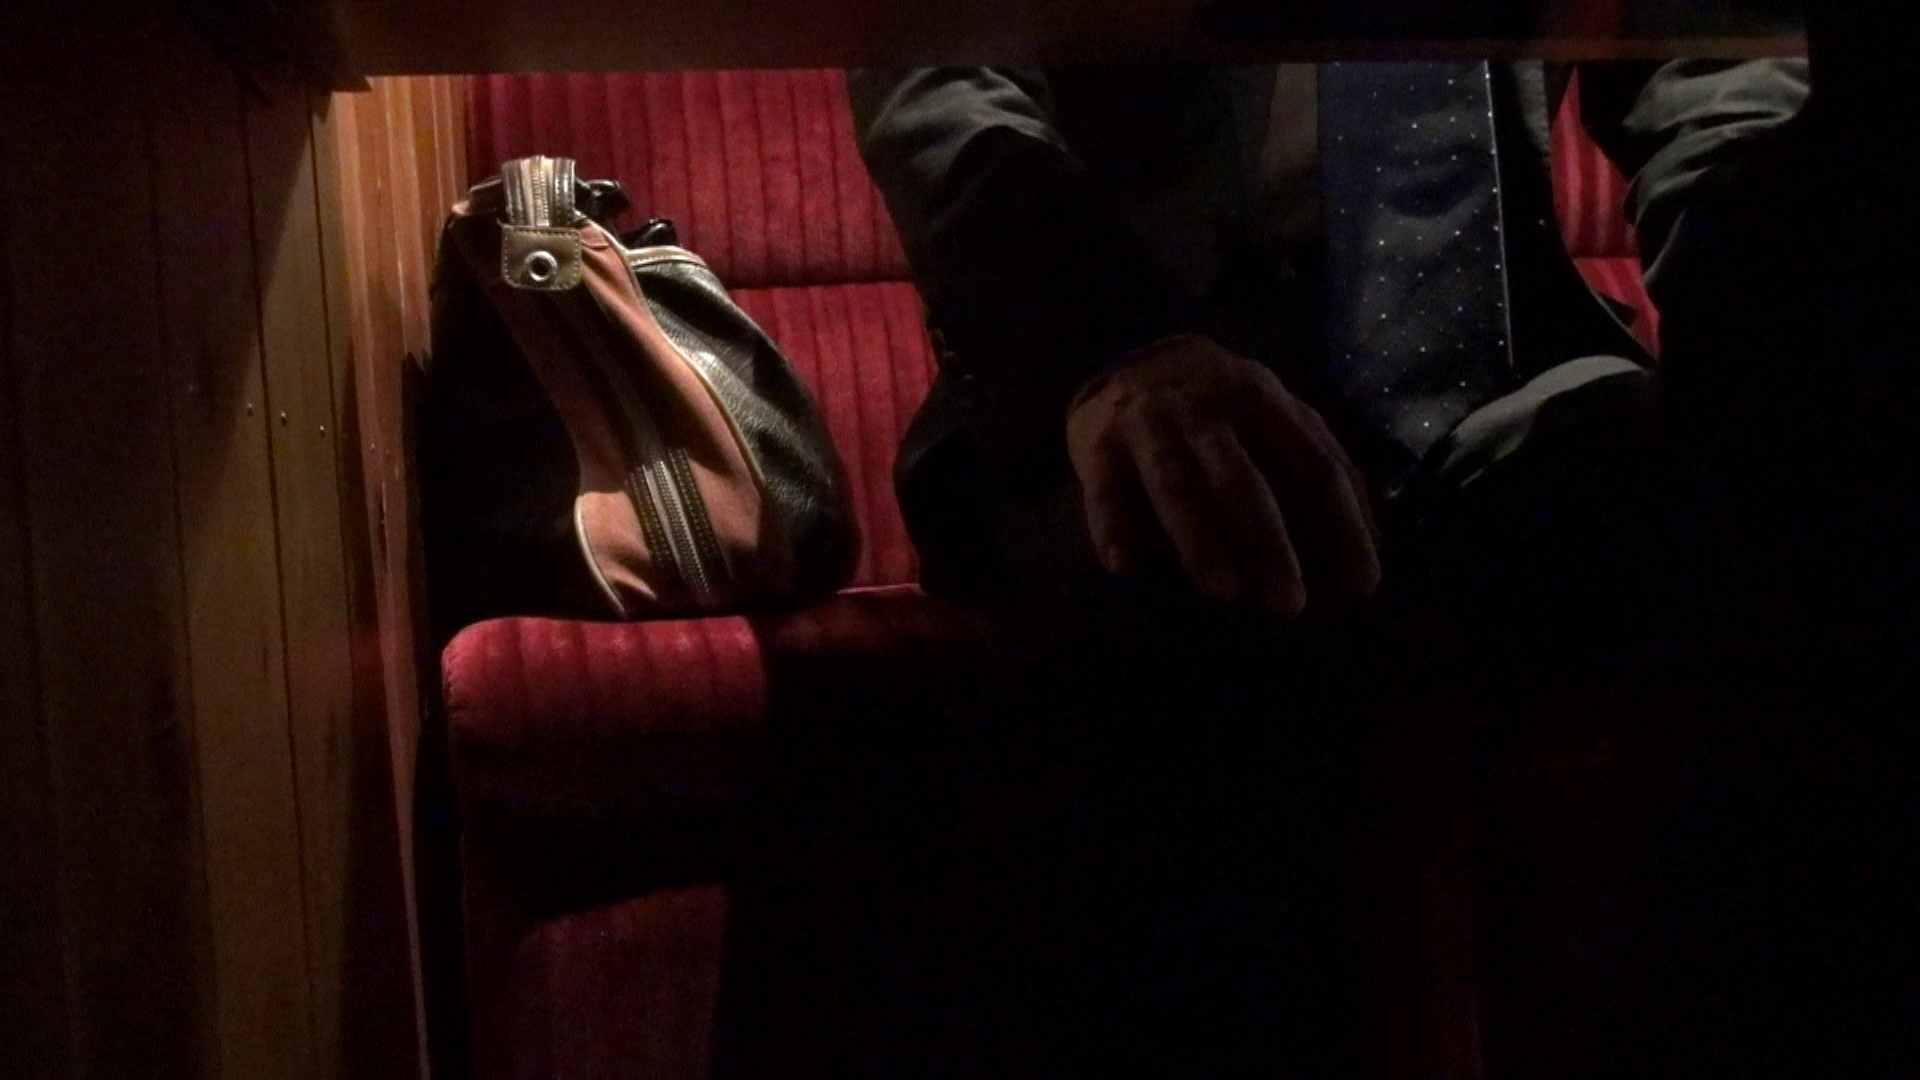 episode1 ヒロトさんと保険外交員との顔合わせ おまんこ無修正 オメコ動画キャプチャ 71pic 24